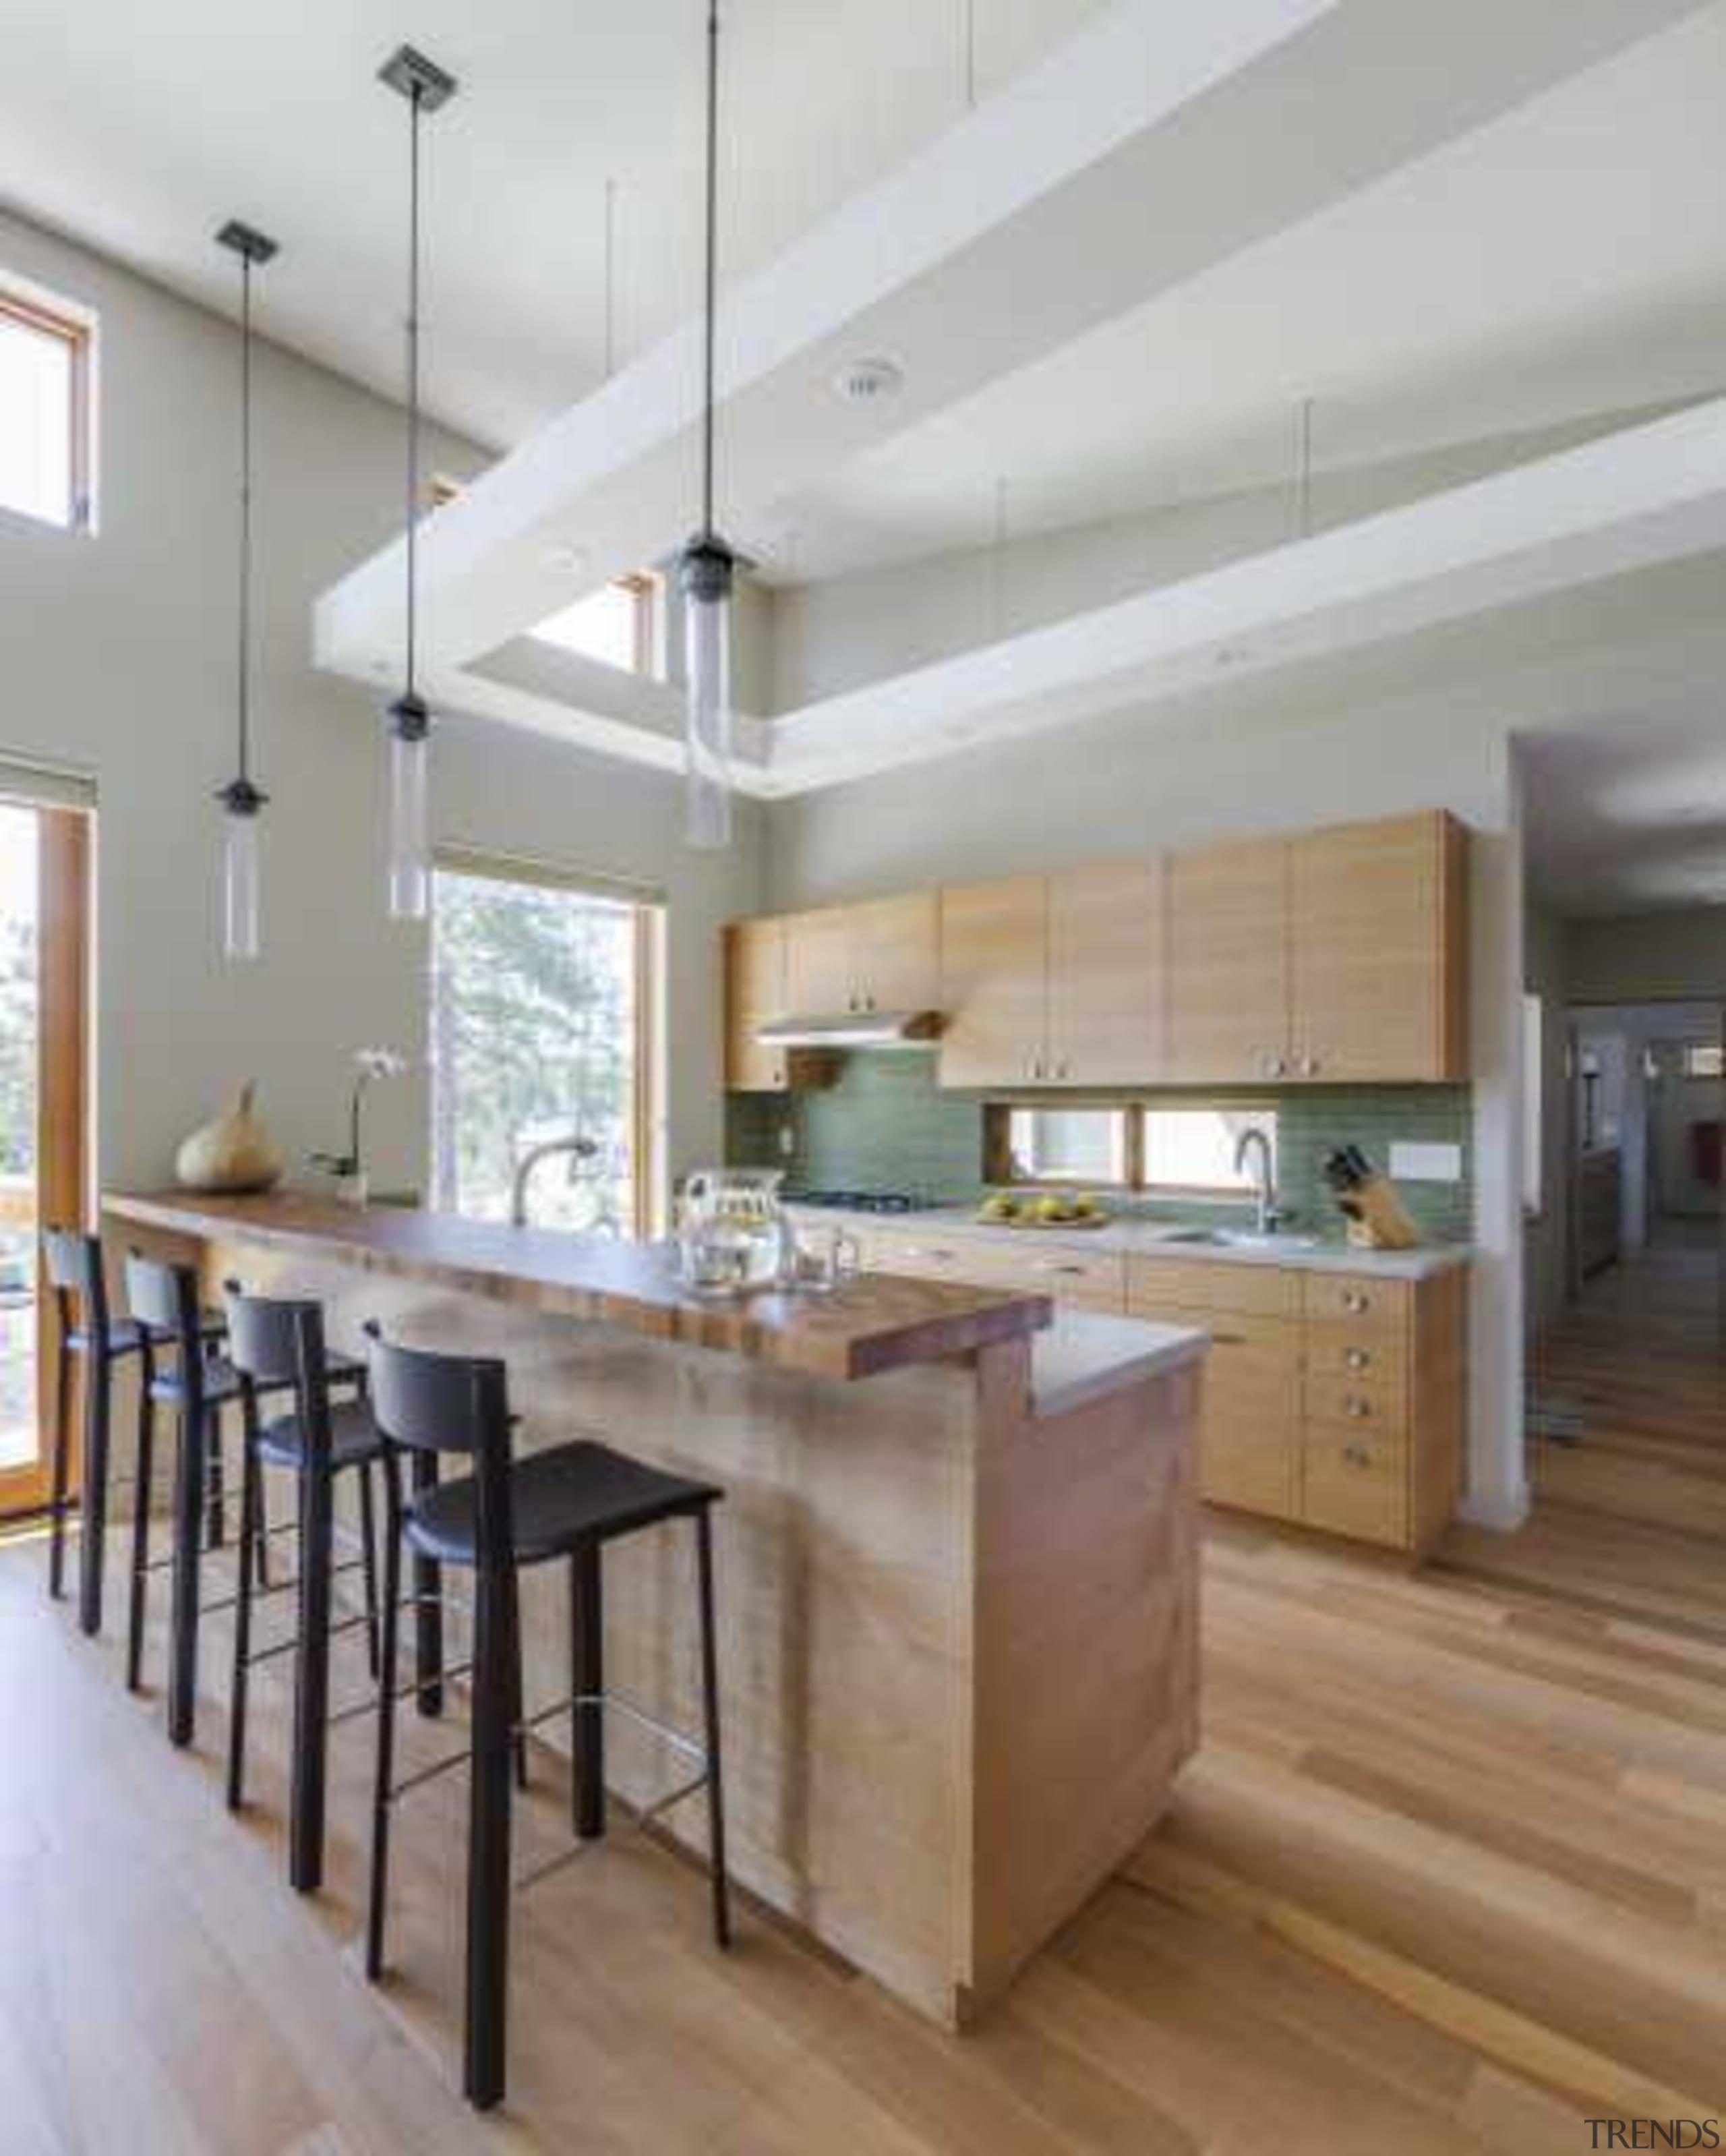 This home looks the part in a winter cabinetry, ceiling, countertop, cuisine classique, floor, flooring, hardwood, interior design, kitchen, laminate flooring, wood flooring, gray